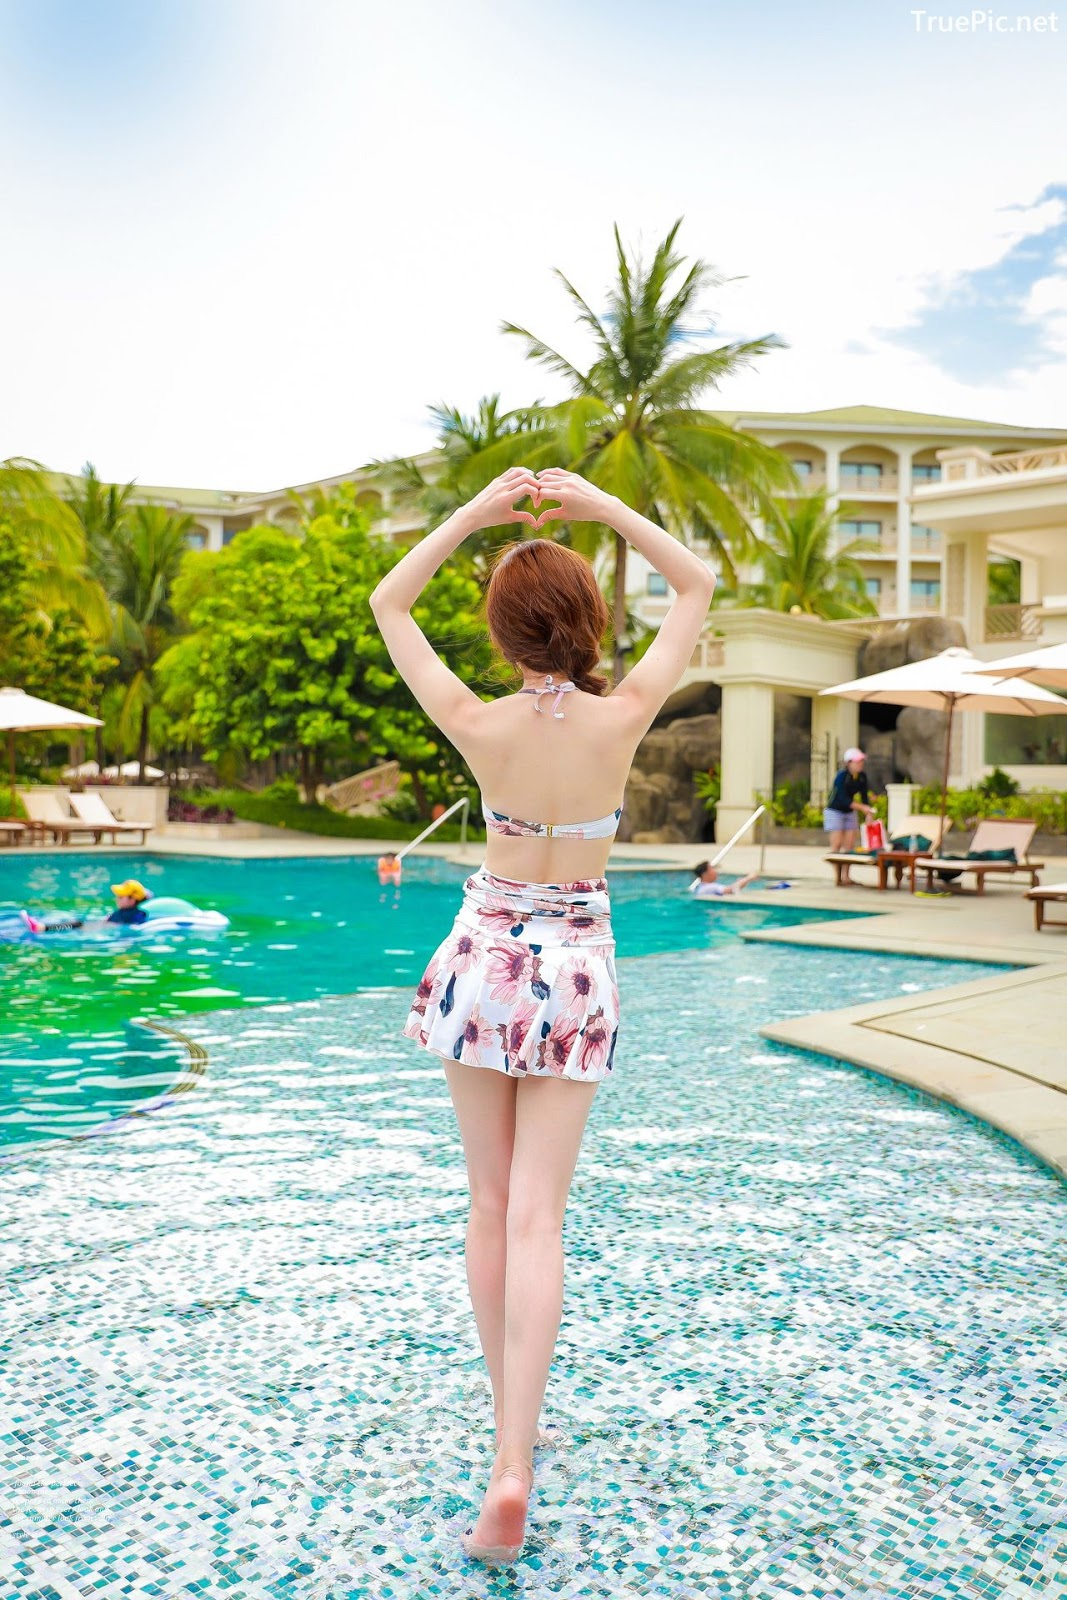 Image Korean Fashion Model - Kim Hee Jeong - Pink Fantasy Flamingo Swimsuit - TruePic.net - Picture-4